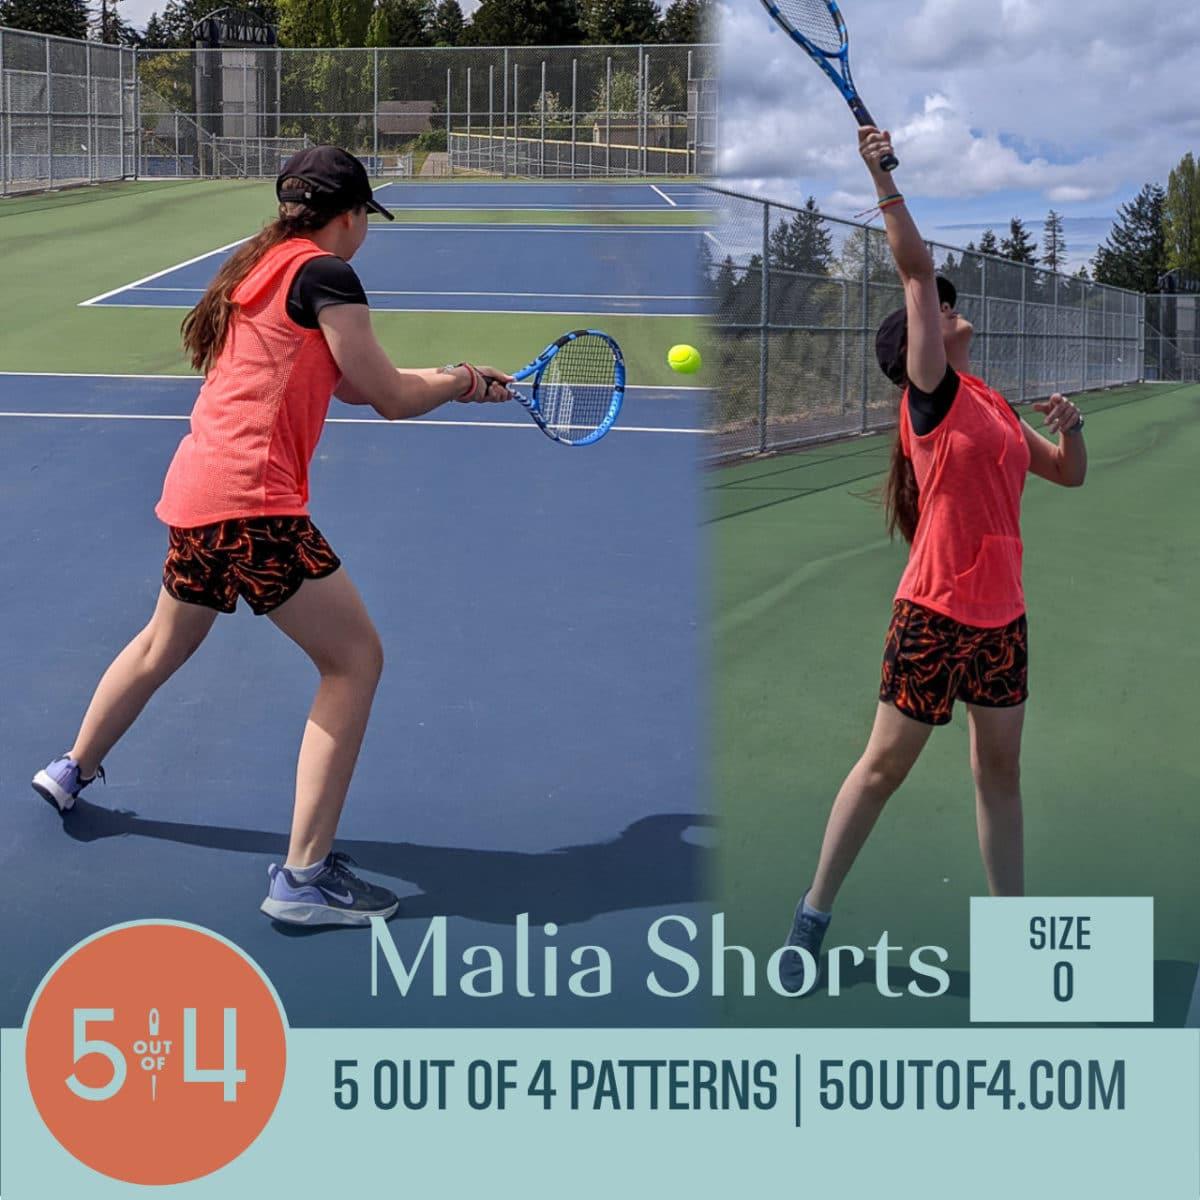 Malia Shorts Size 0